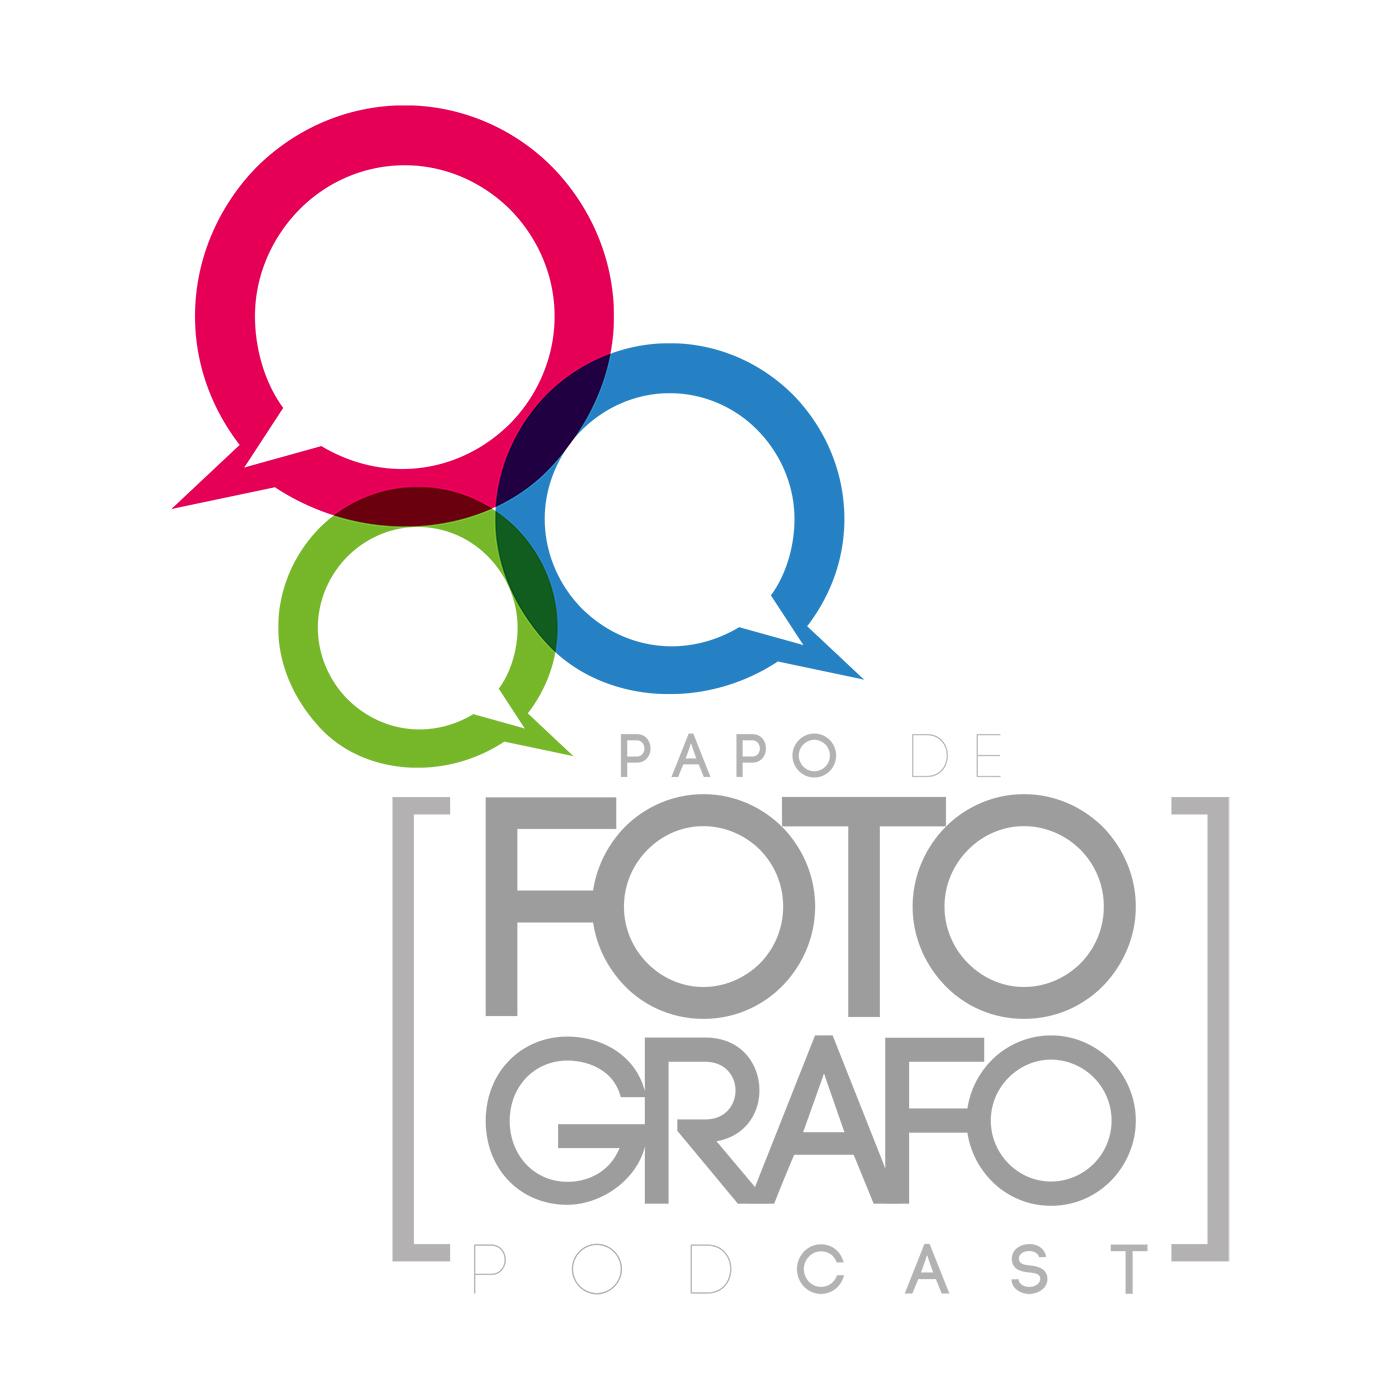 Papo de Fotógrafo by Ana Cariane e Rafael Petrocco on Apple Podcasts ae30d5226fc6f